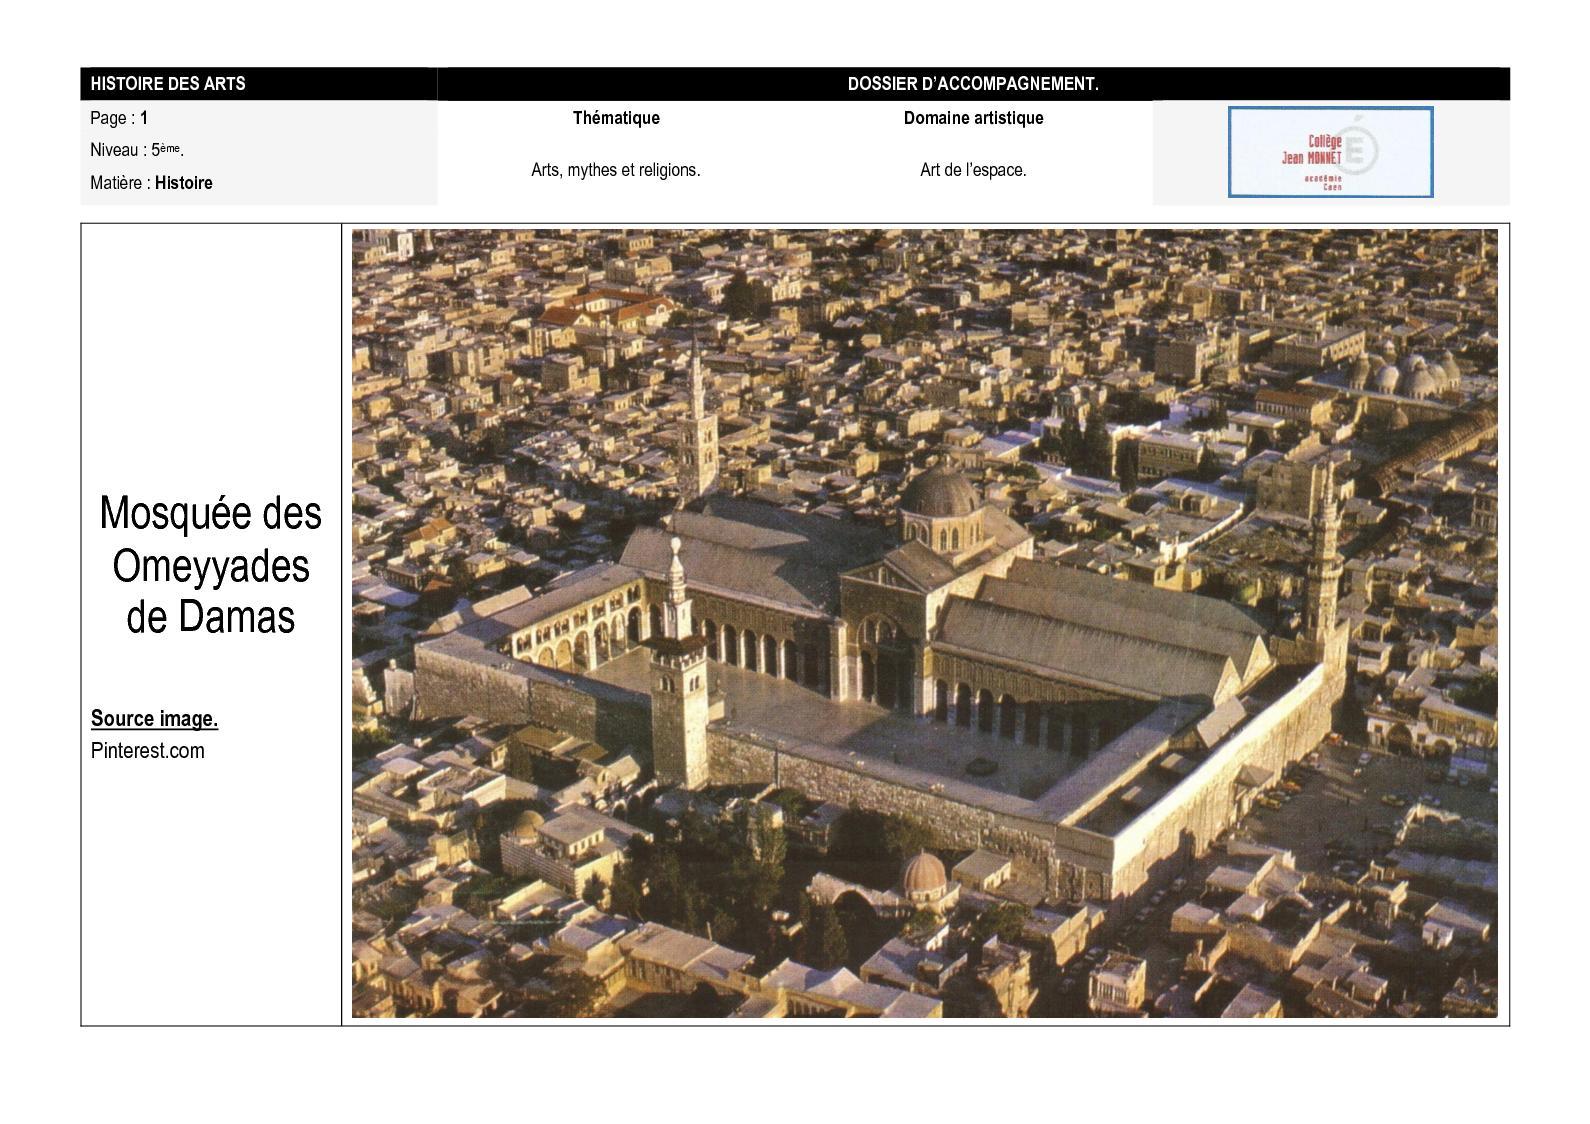 Mosquee de Damas